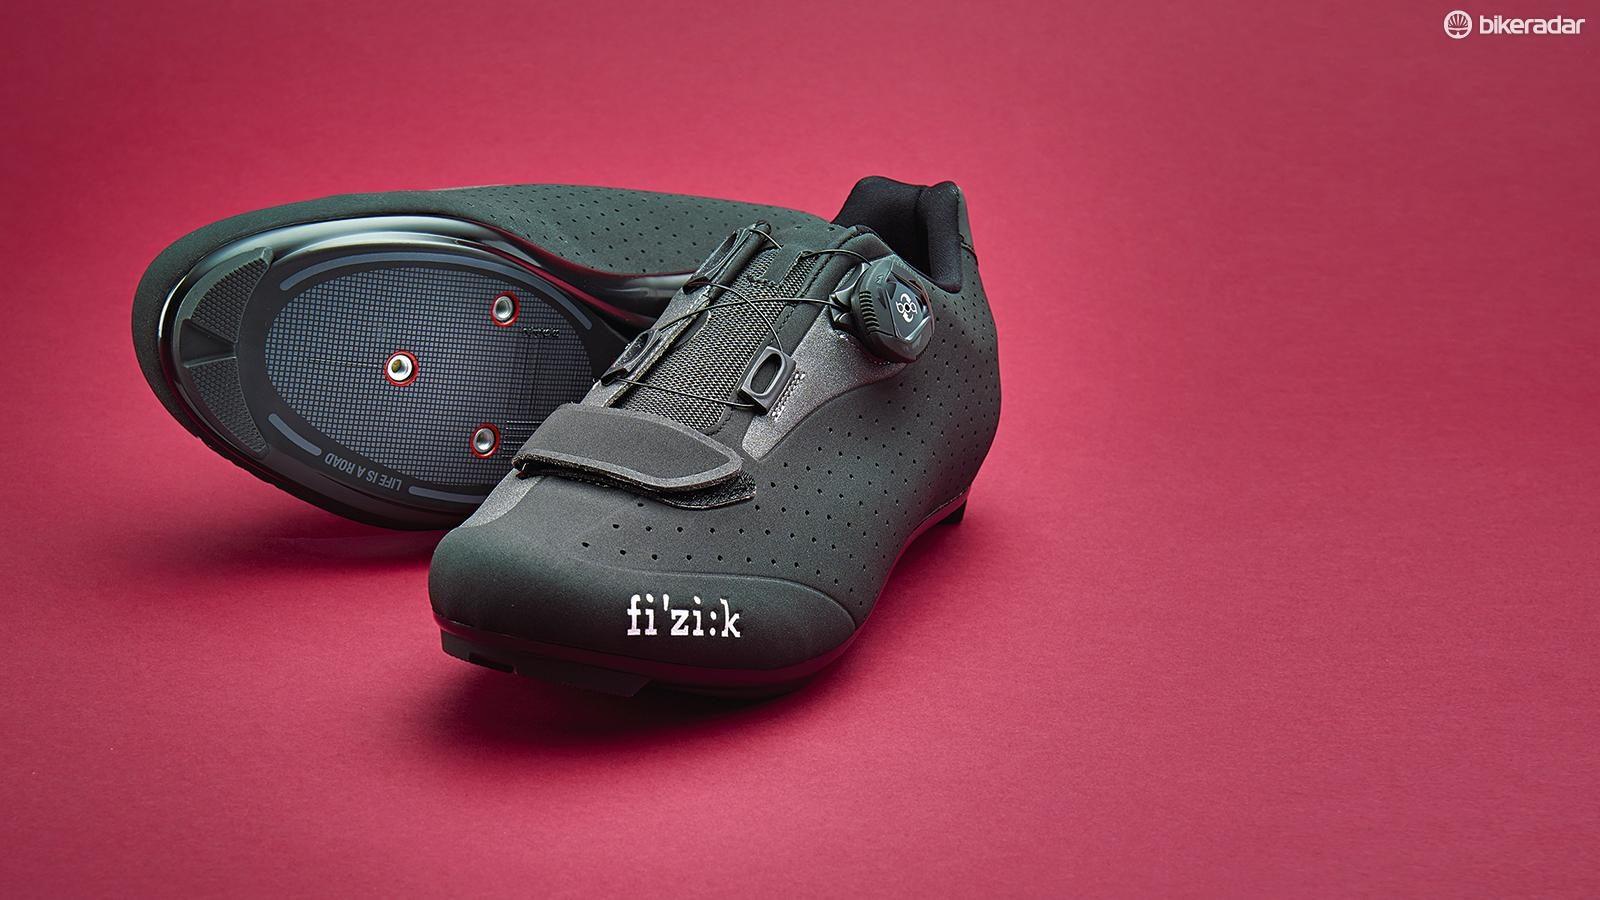 Fizik R5B shoes review - BikeRadar